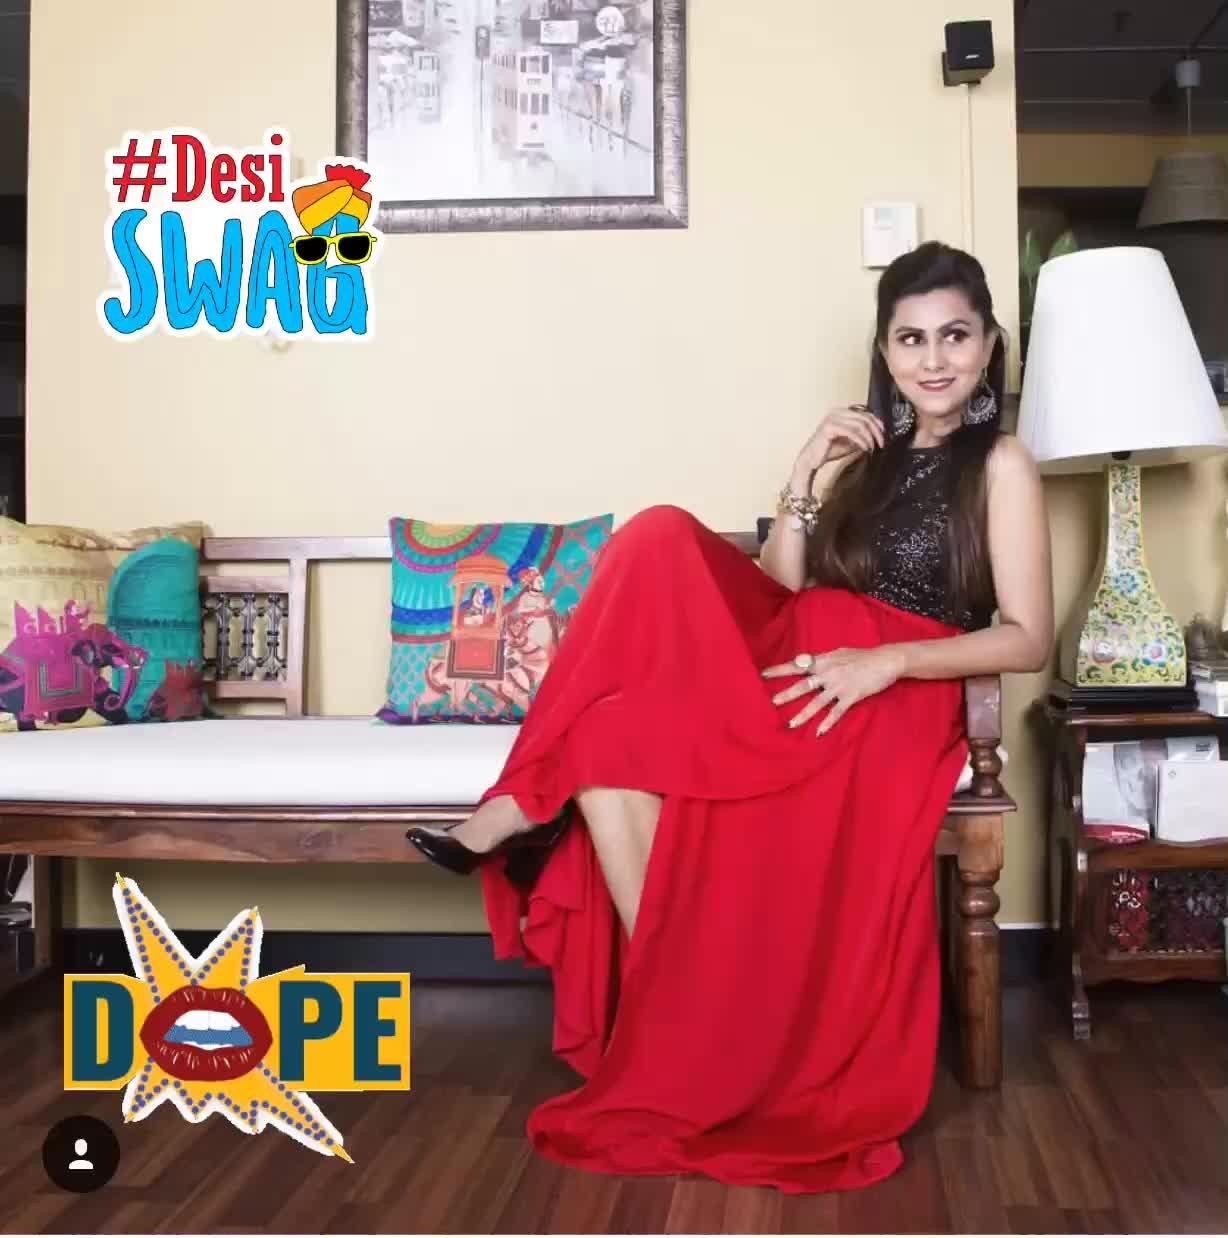 #dubaibeautyblogger #dubaiblogger #delhifashionblogger #beauty #beautyblogger #picoftheday #swissblogger #swissbeautyblogger #indianblogger #indianbeautyblogger #makeupartist #instafashion #mydubai #stylist #dubaiblogger #uae #uaeblogger #delhibeautyblogger #indianfashionblogger #ootd #redskirt #photooftheday #uaefashionblogger #bblogger #dubaigirl  #festiveoutfit #beautytips #swissfashionblogger #dubaifashionblogger #sequinedtop #sequins #desiswag #dope